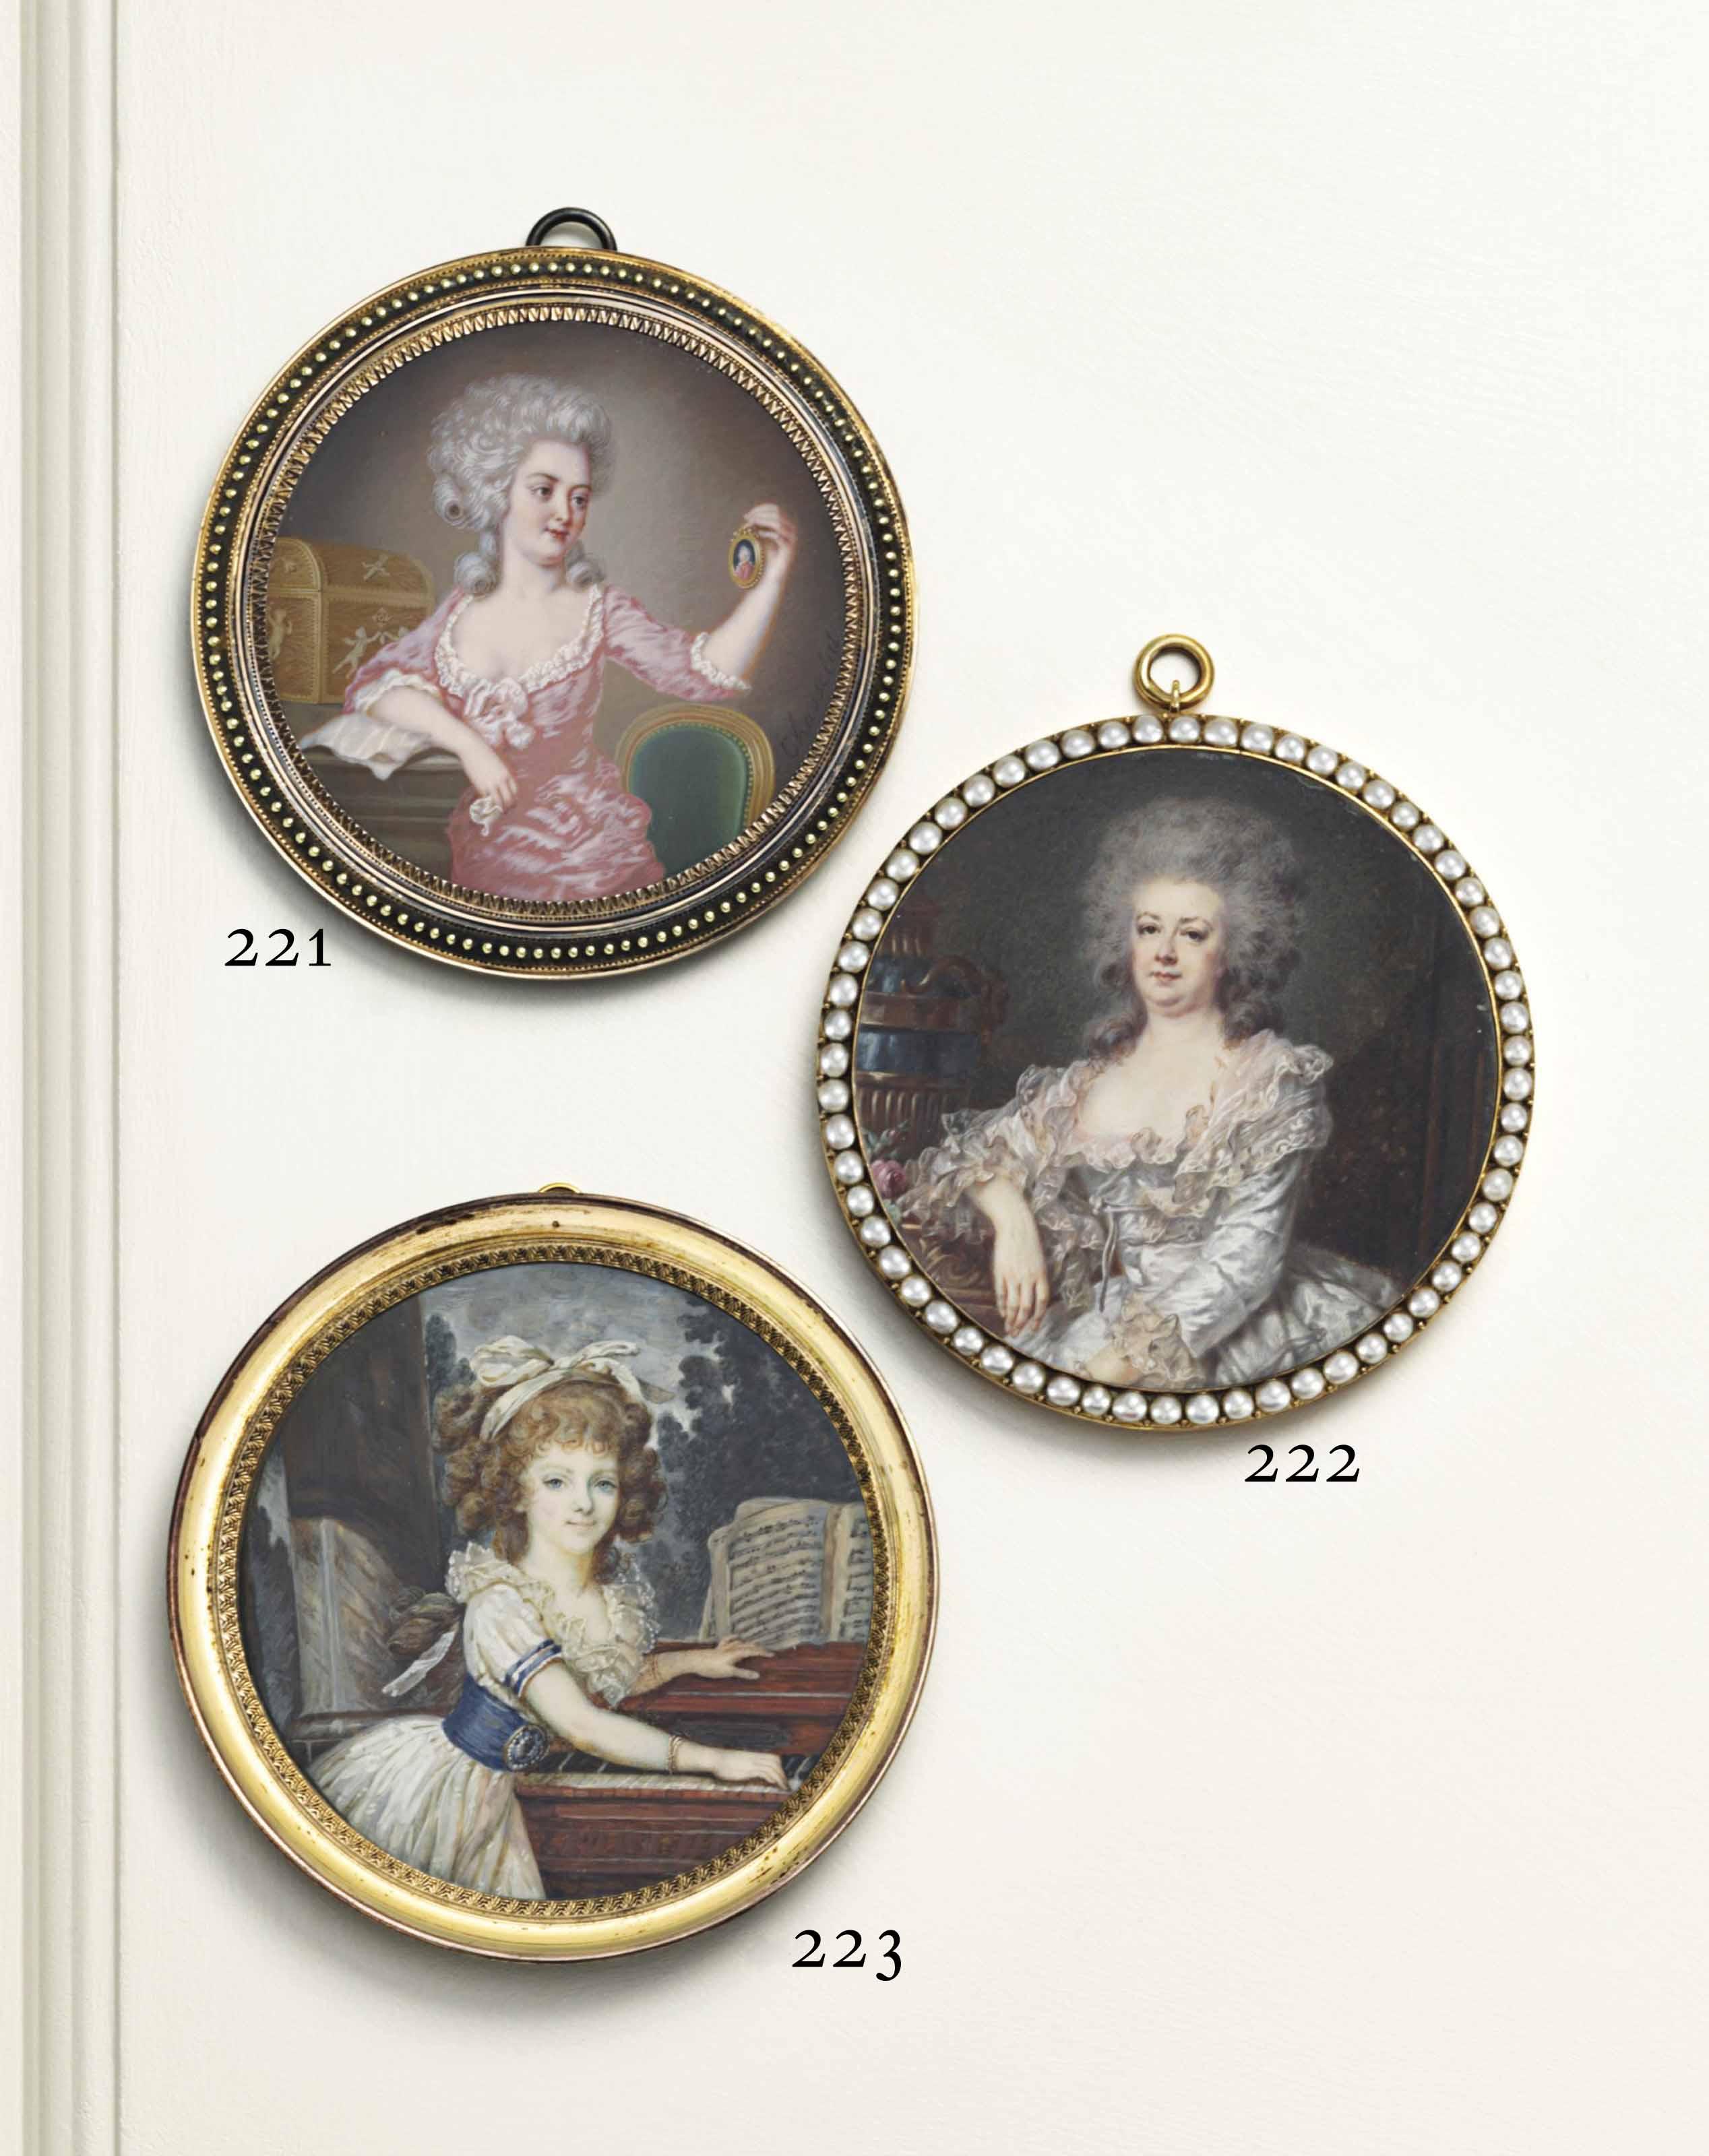 AFTER FRANÇOIS DUMONT (FRENCH, 1751-1831)